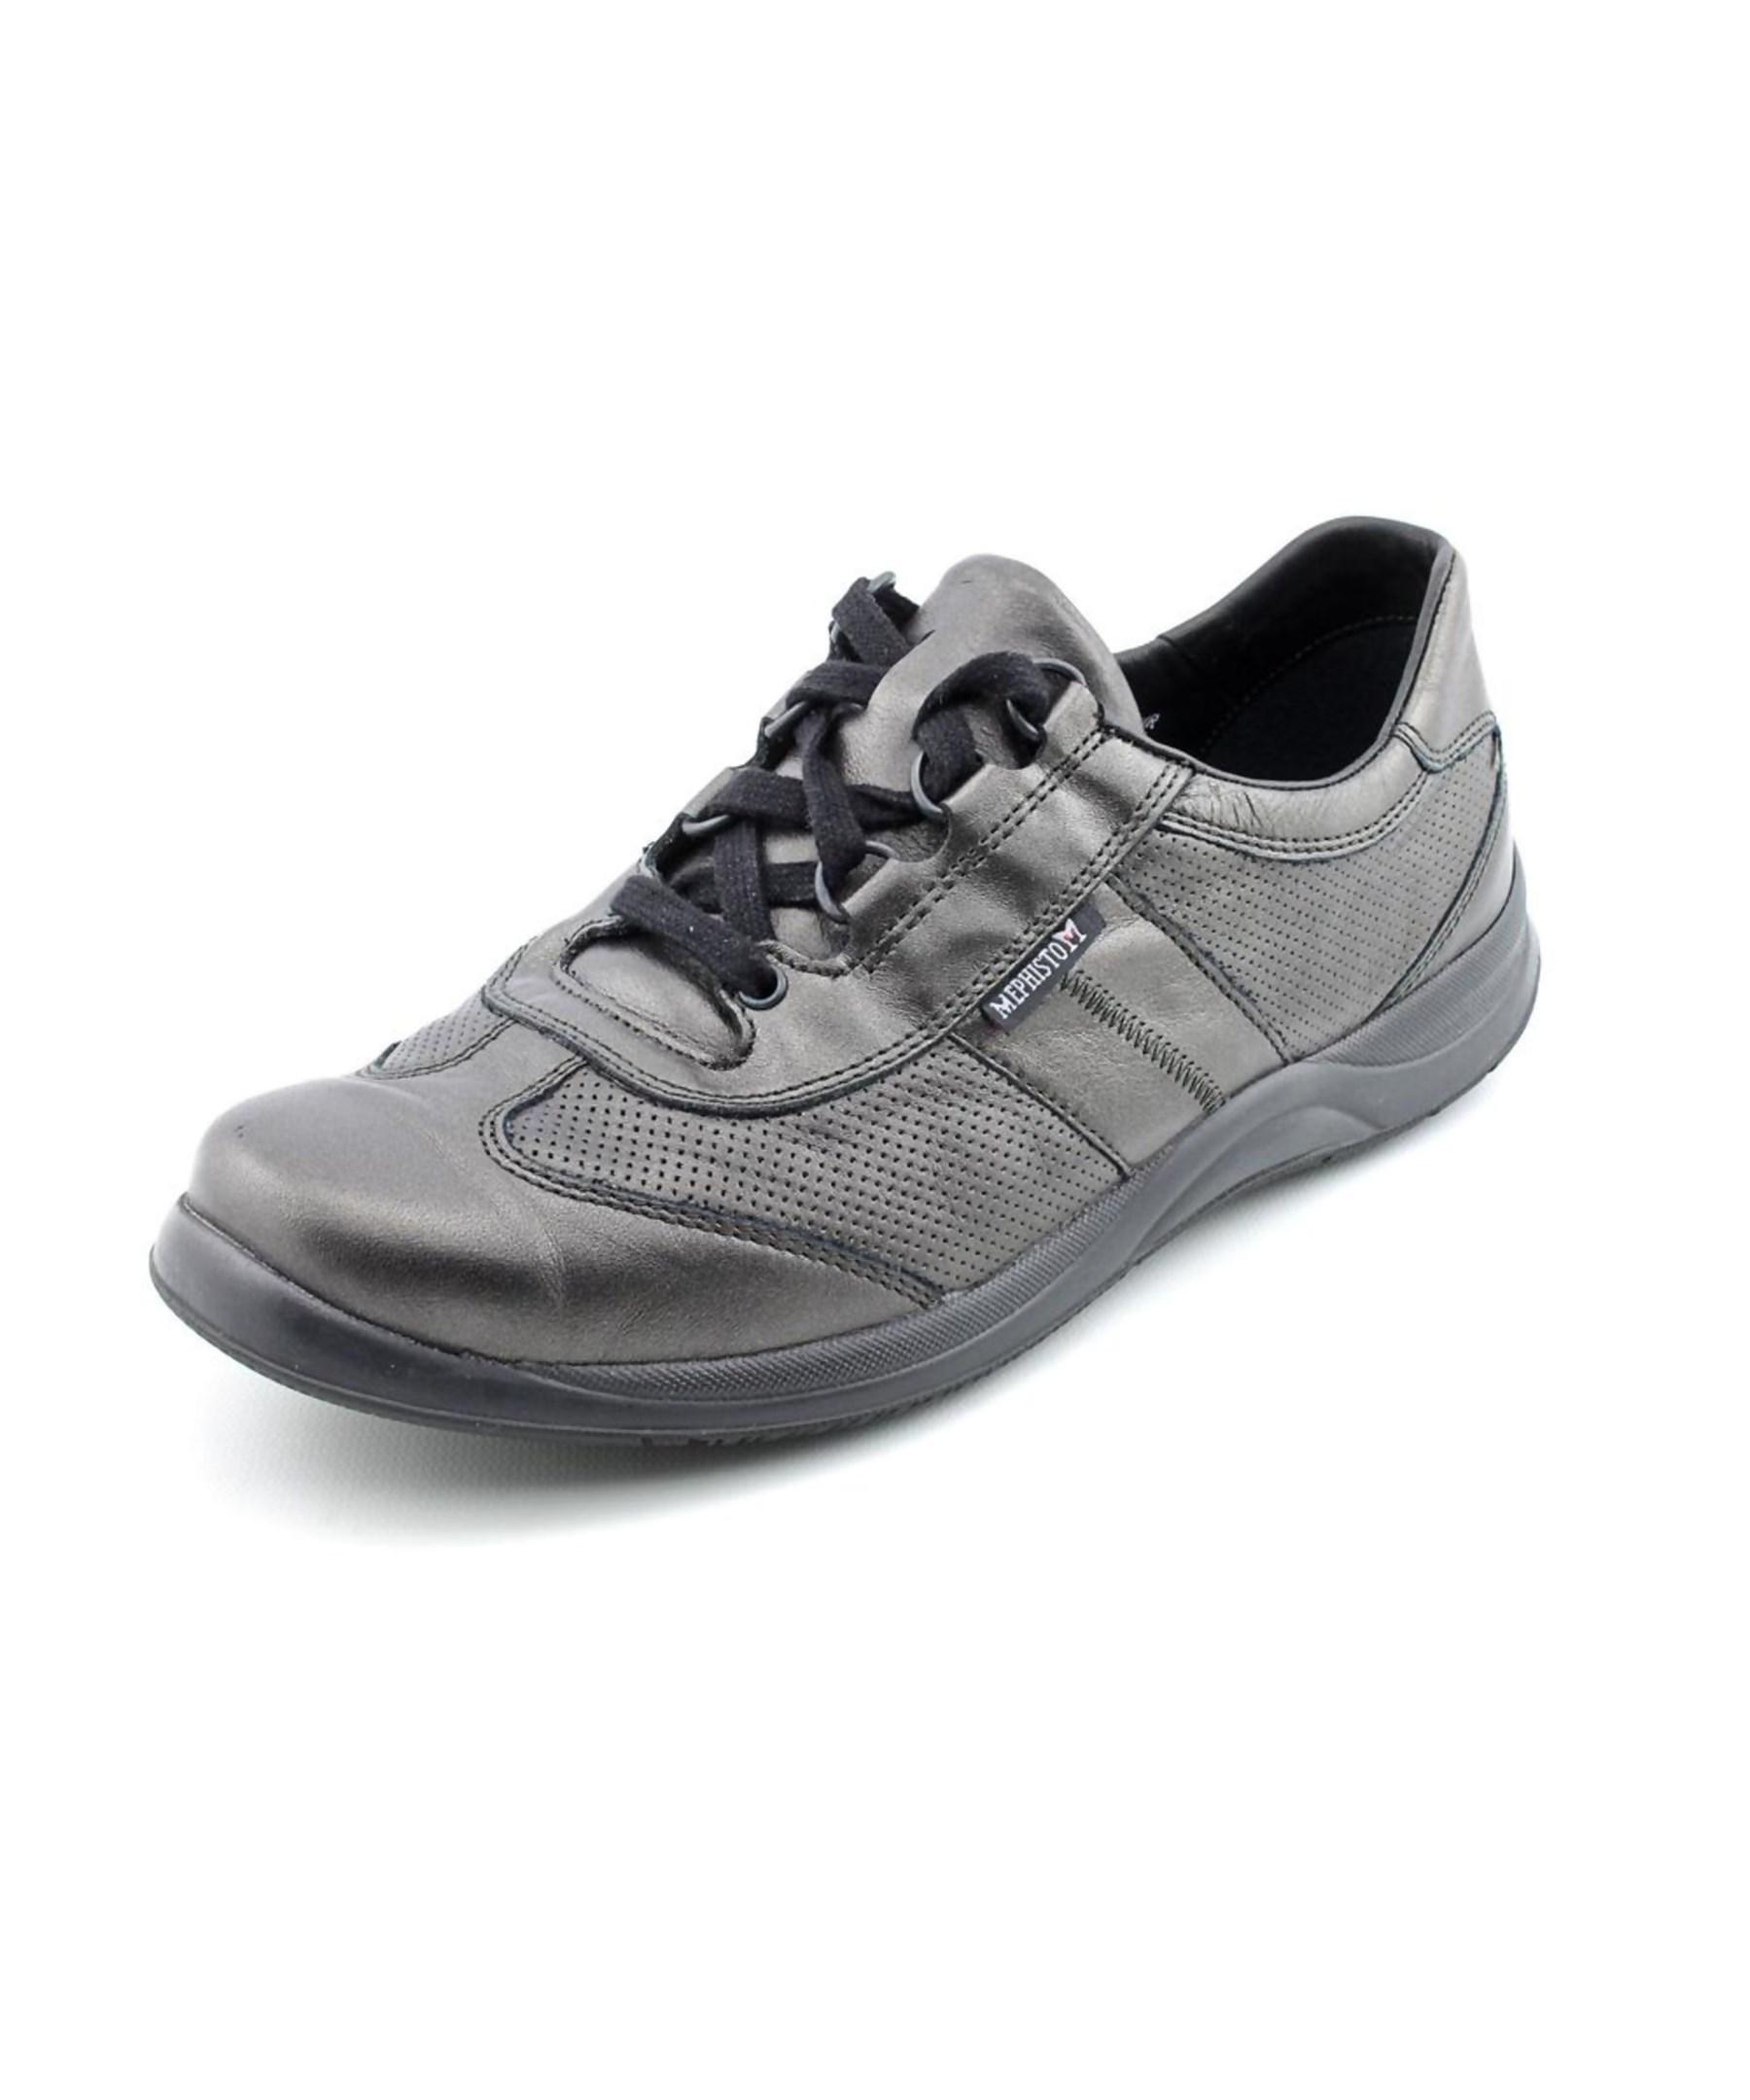 Mephisto Laser Walking Shoe